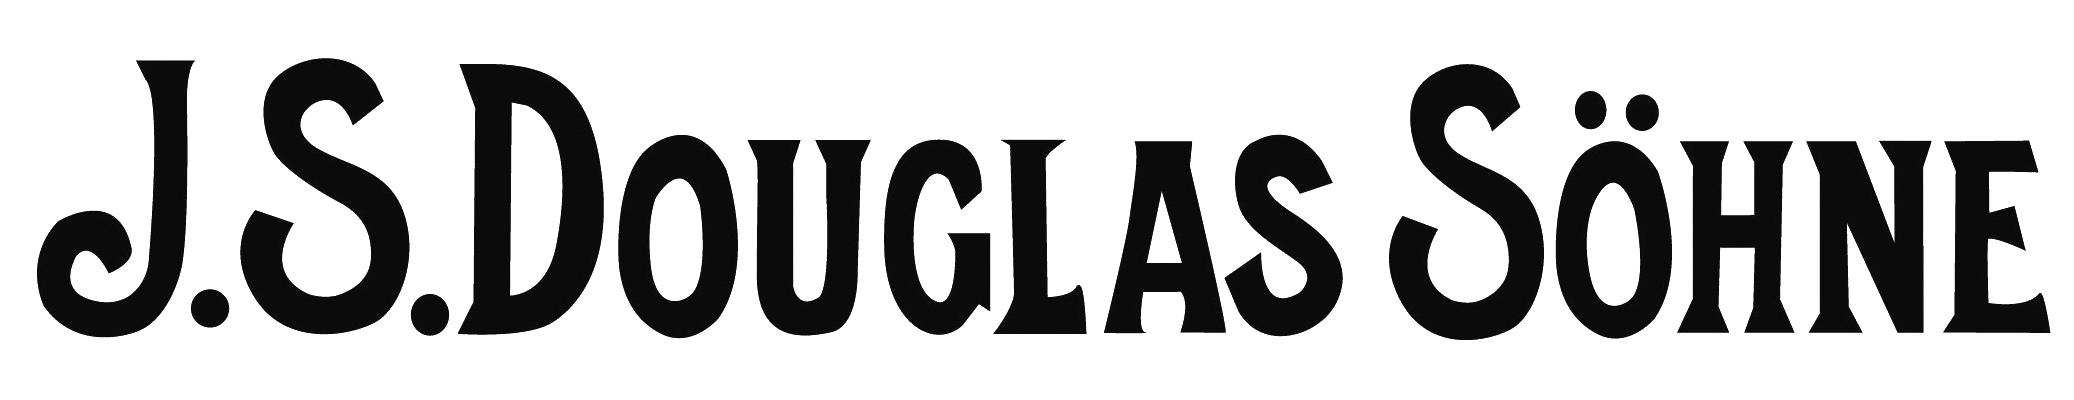 J.S.Douglas Söhne